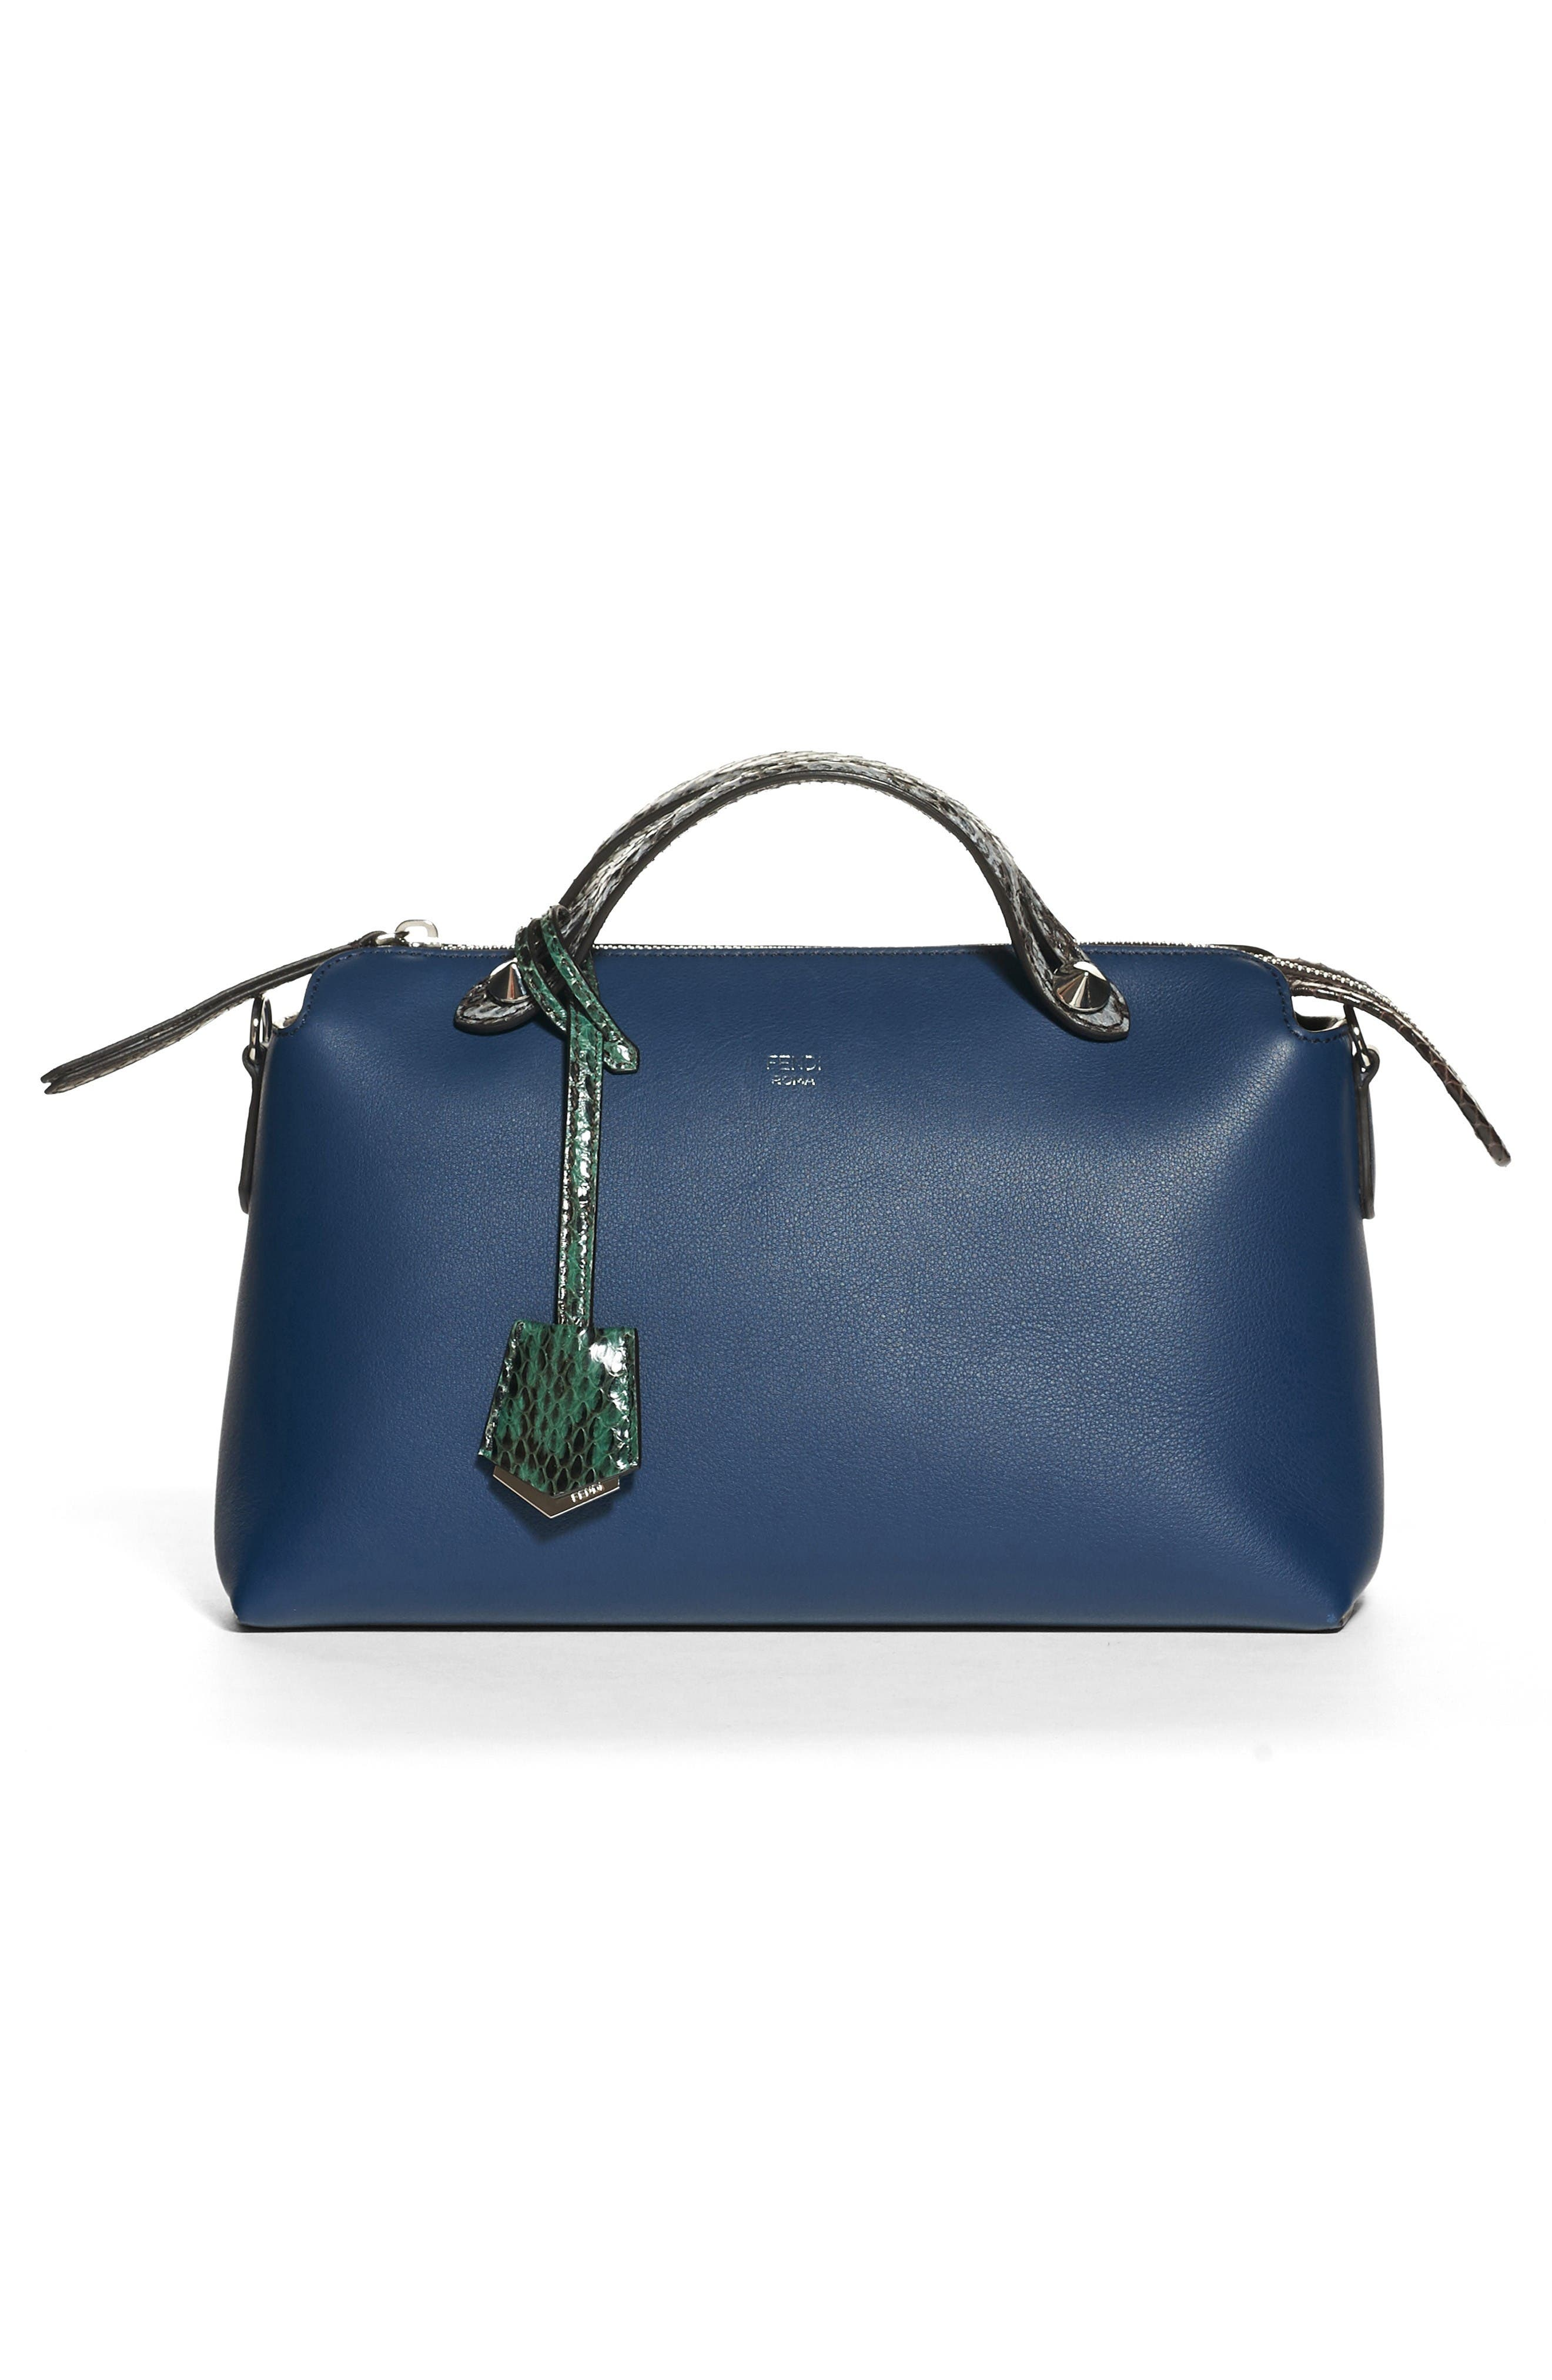 Main Image - Fendi 'Medium By the Way' Calfskin Leather Shoulder Bag with Genuine Snakeskin Trim